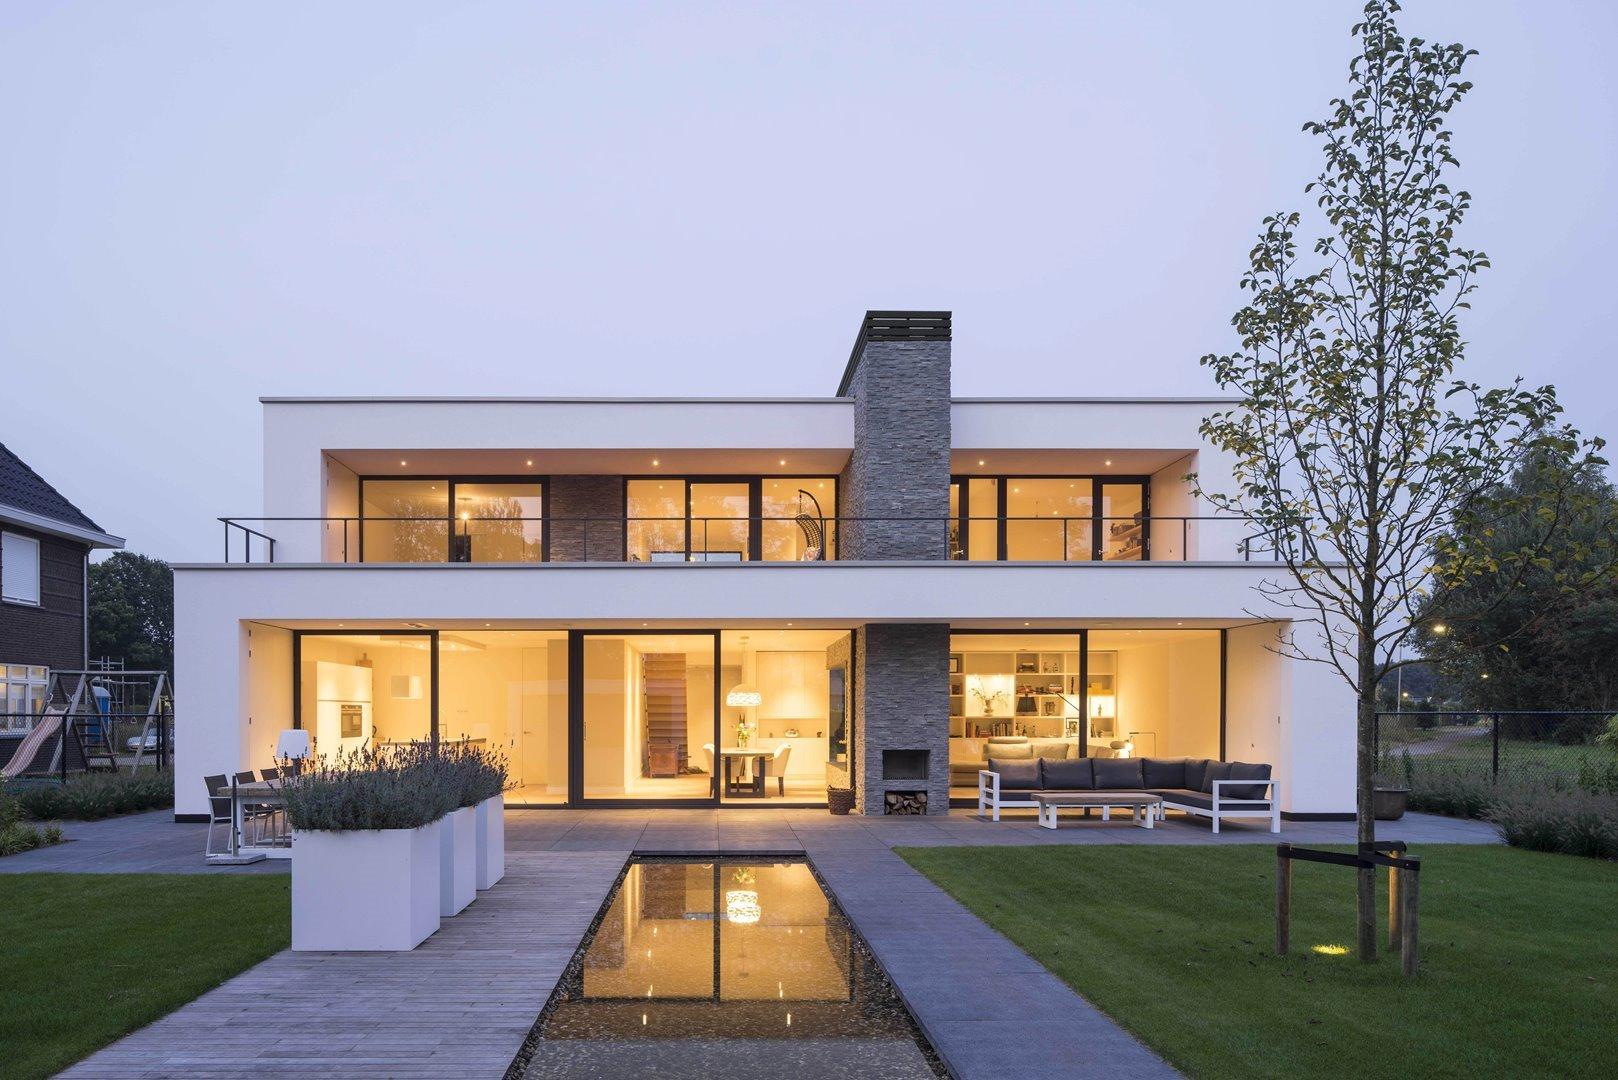 Gevel moderne residence met veel ramen